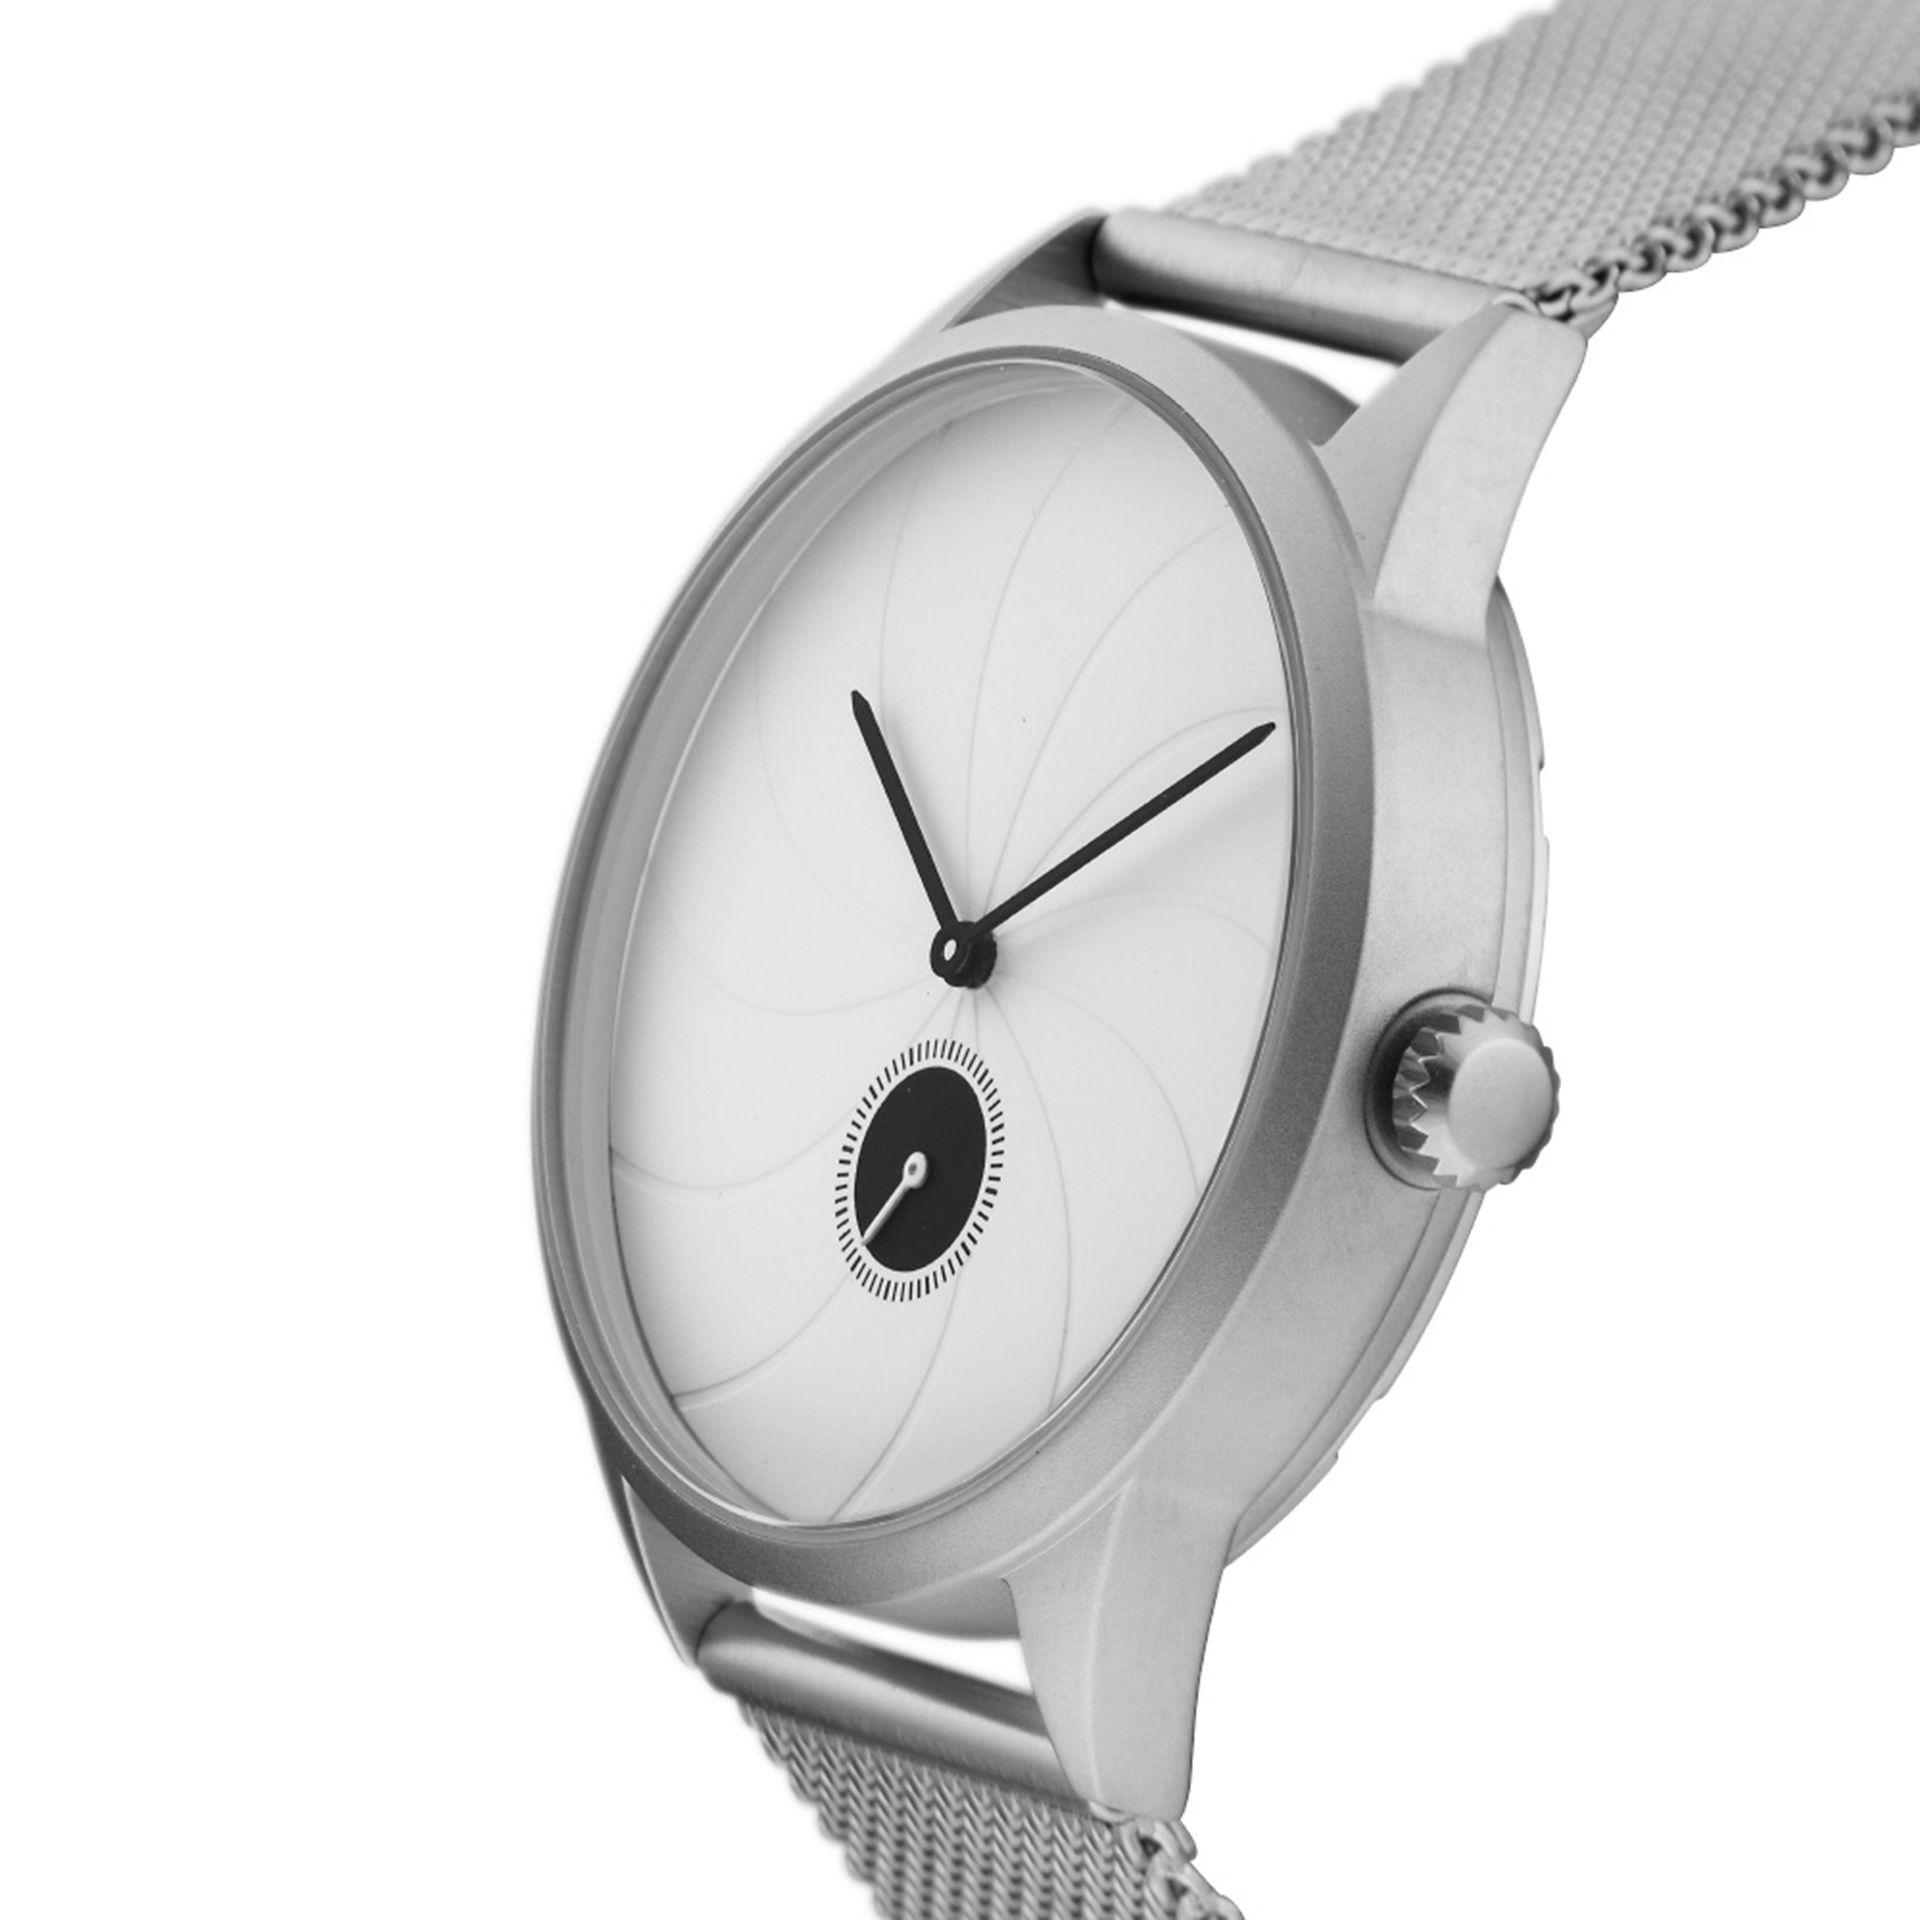 Ny klocka från svenska CHPO